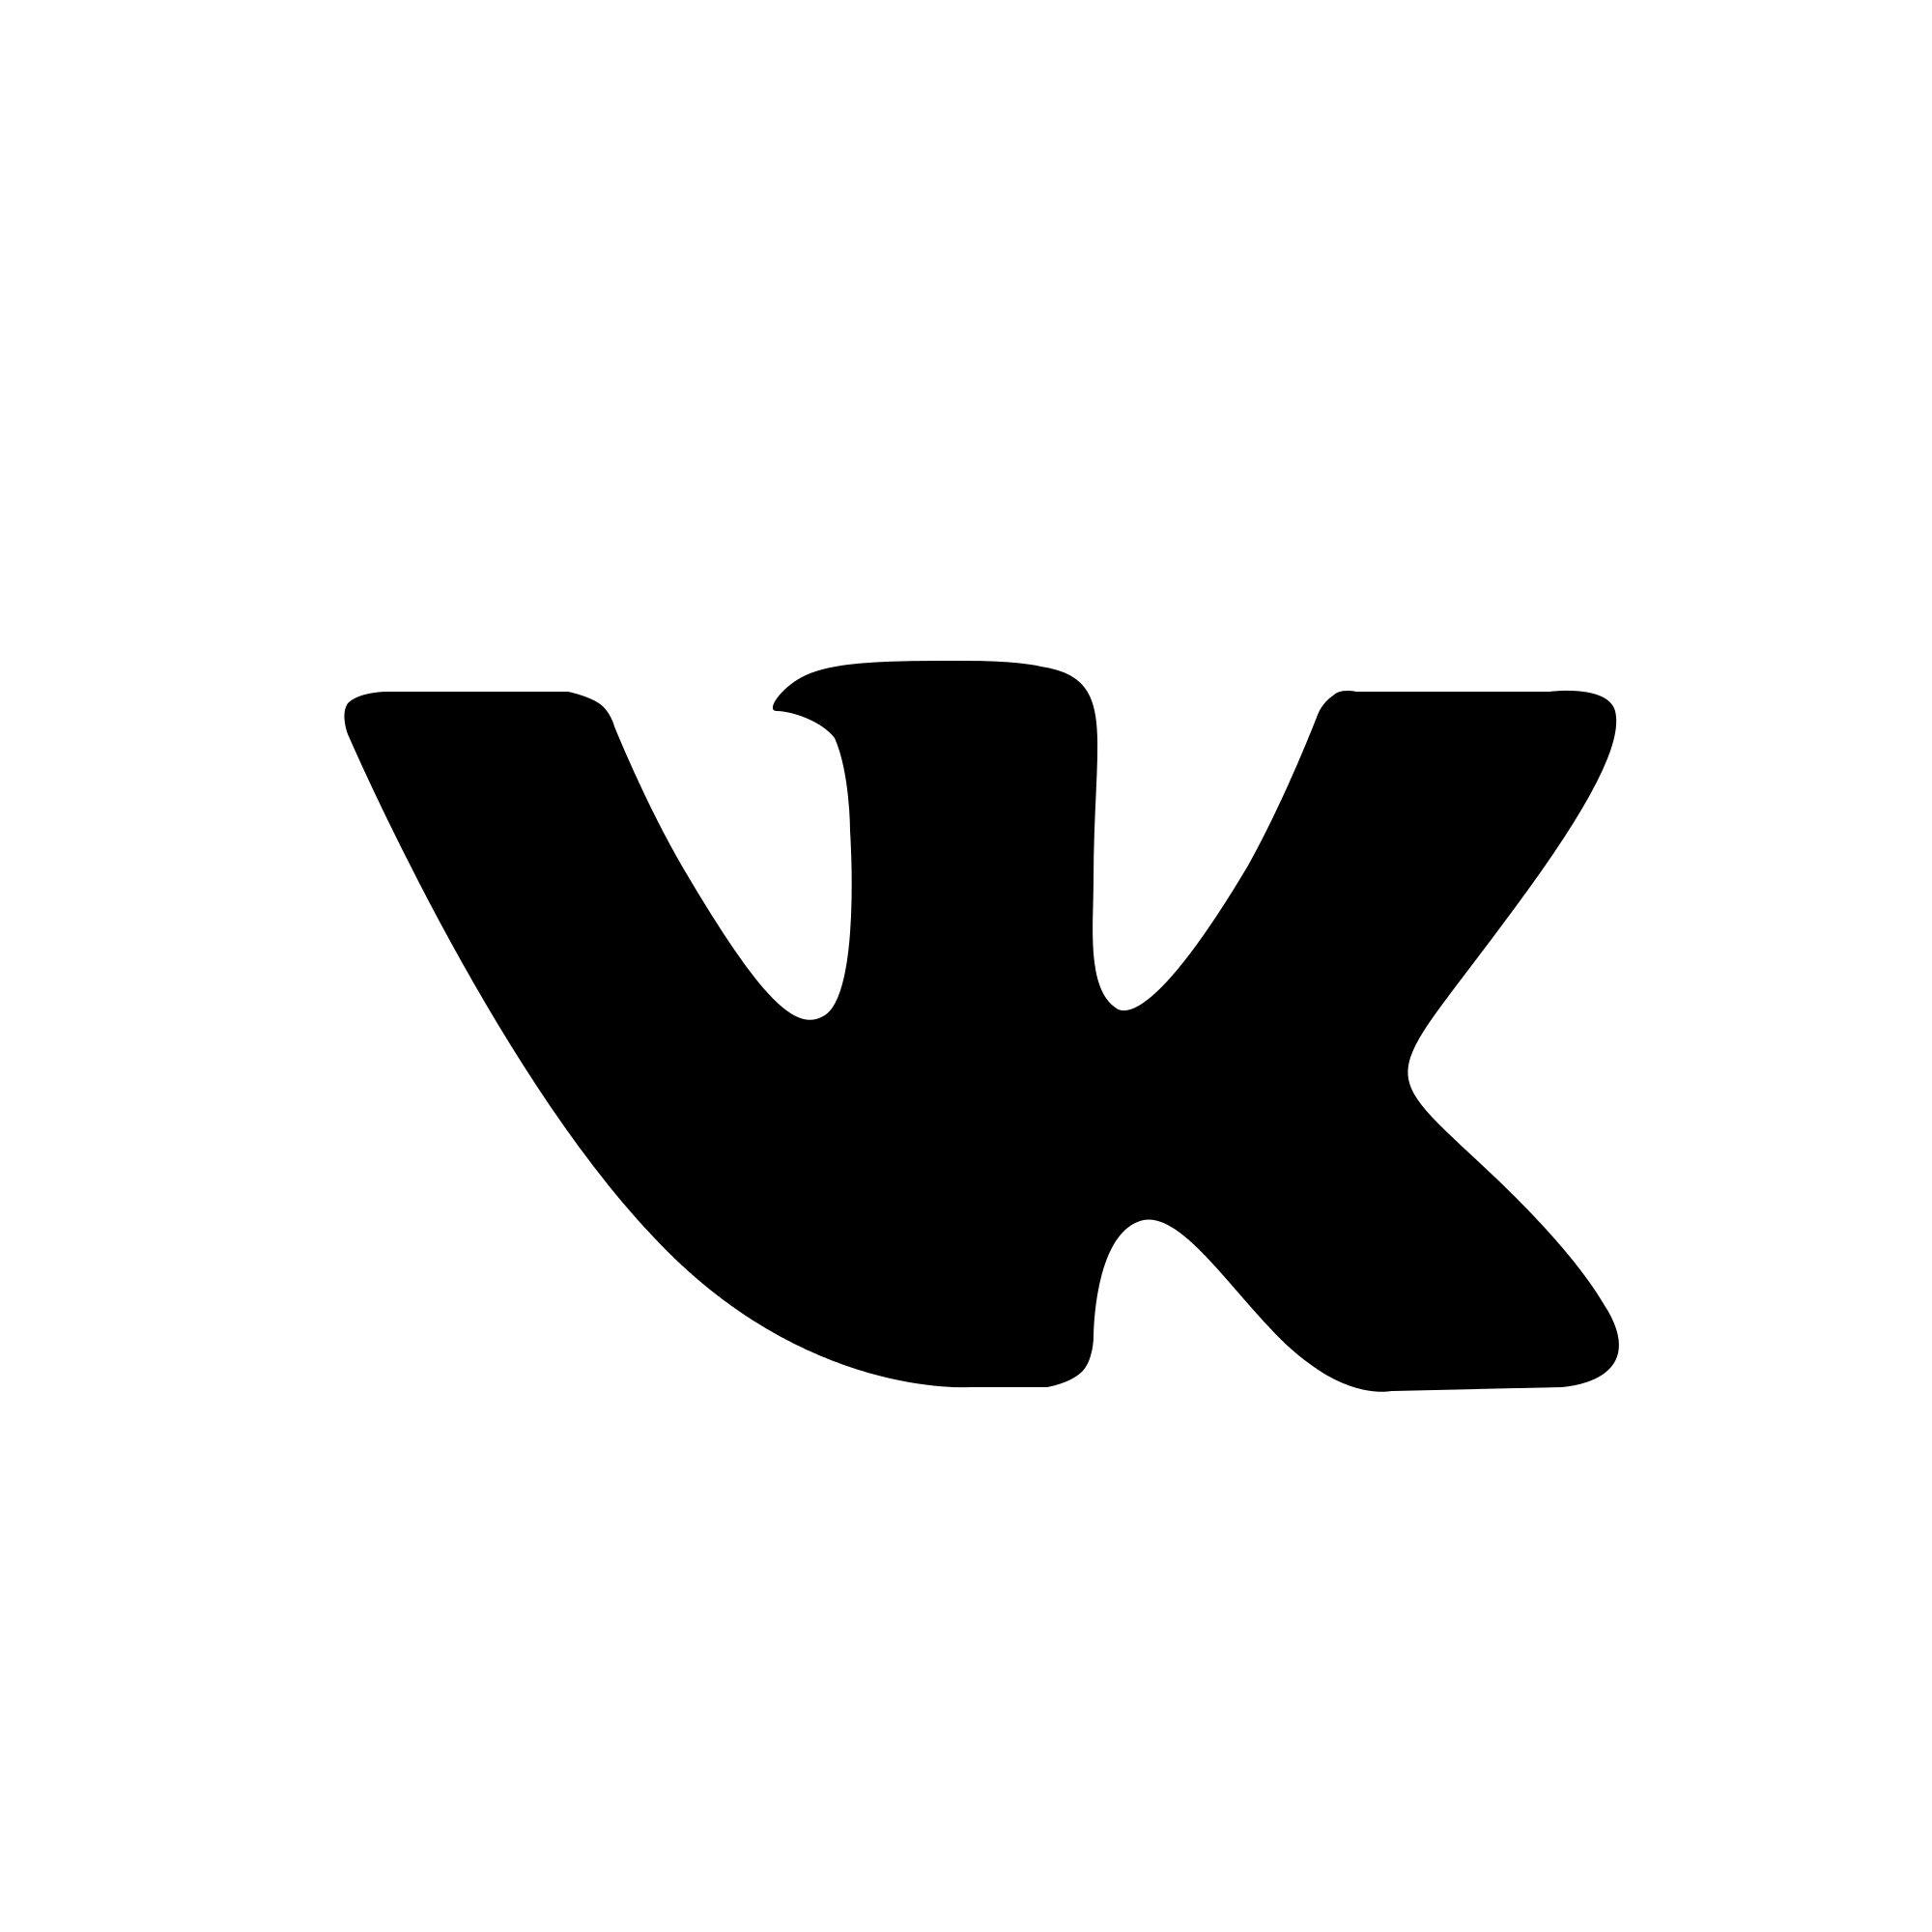 Vkontakte logo PNG image free Download